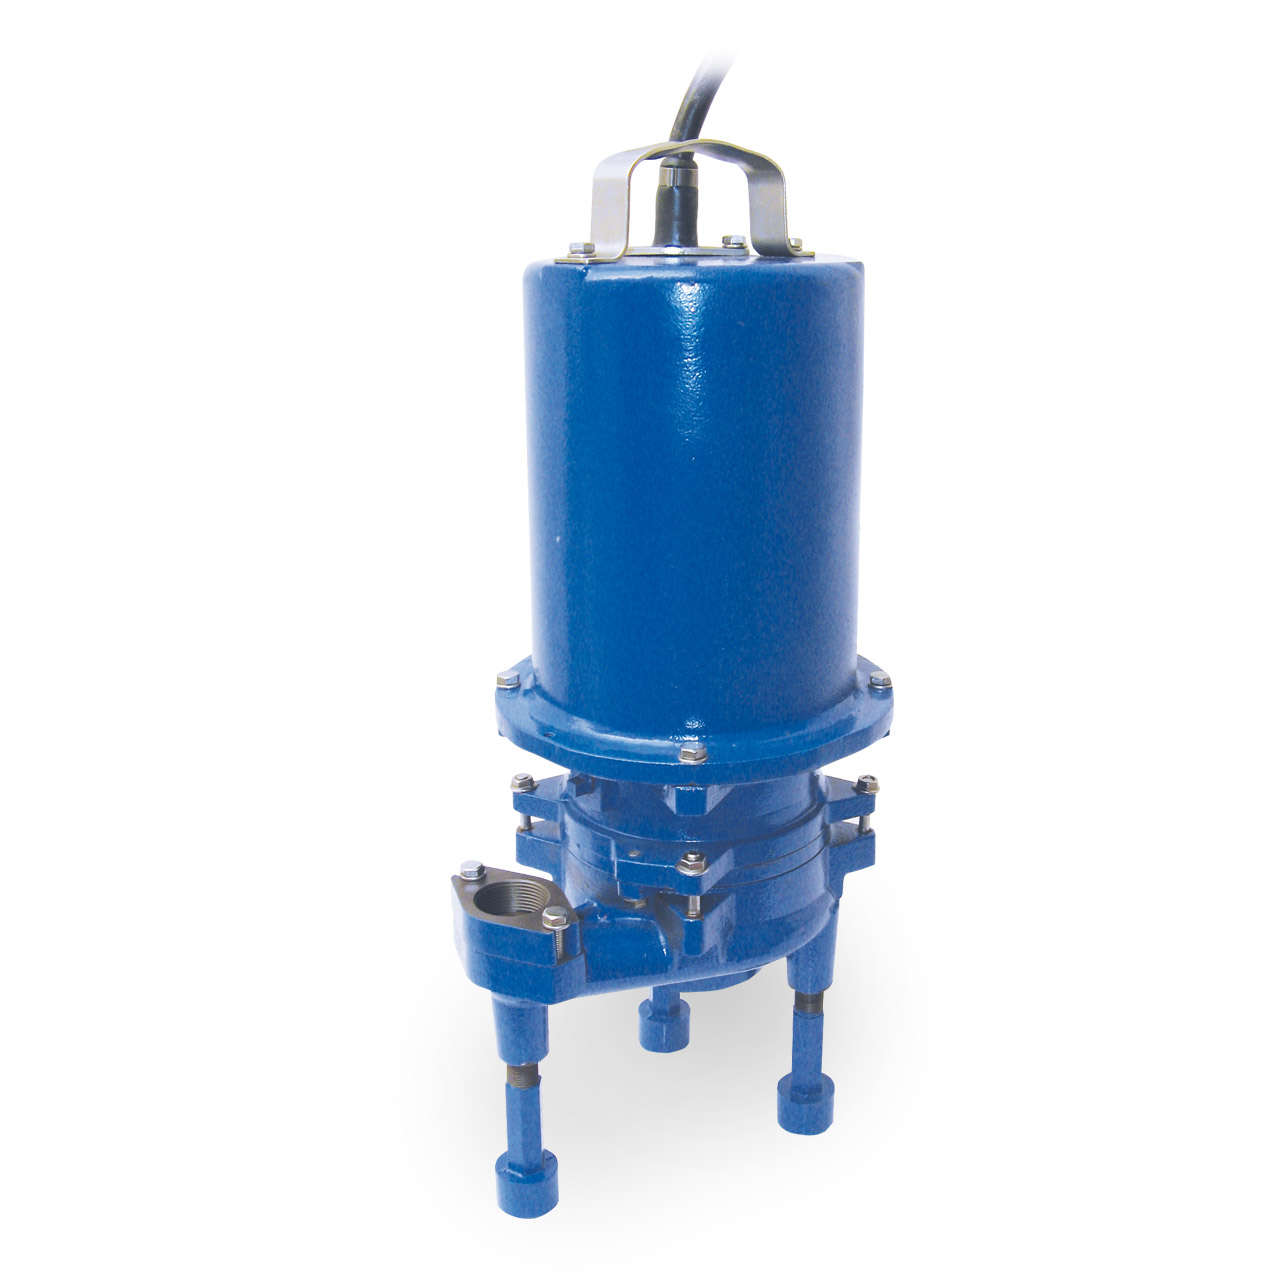 Power Flo Power Flo Pfg2042hh Grinder Pump 2 Hp 460v 3ph